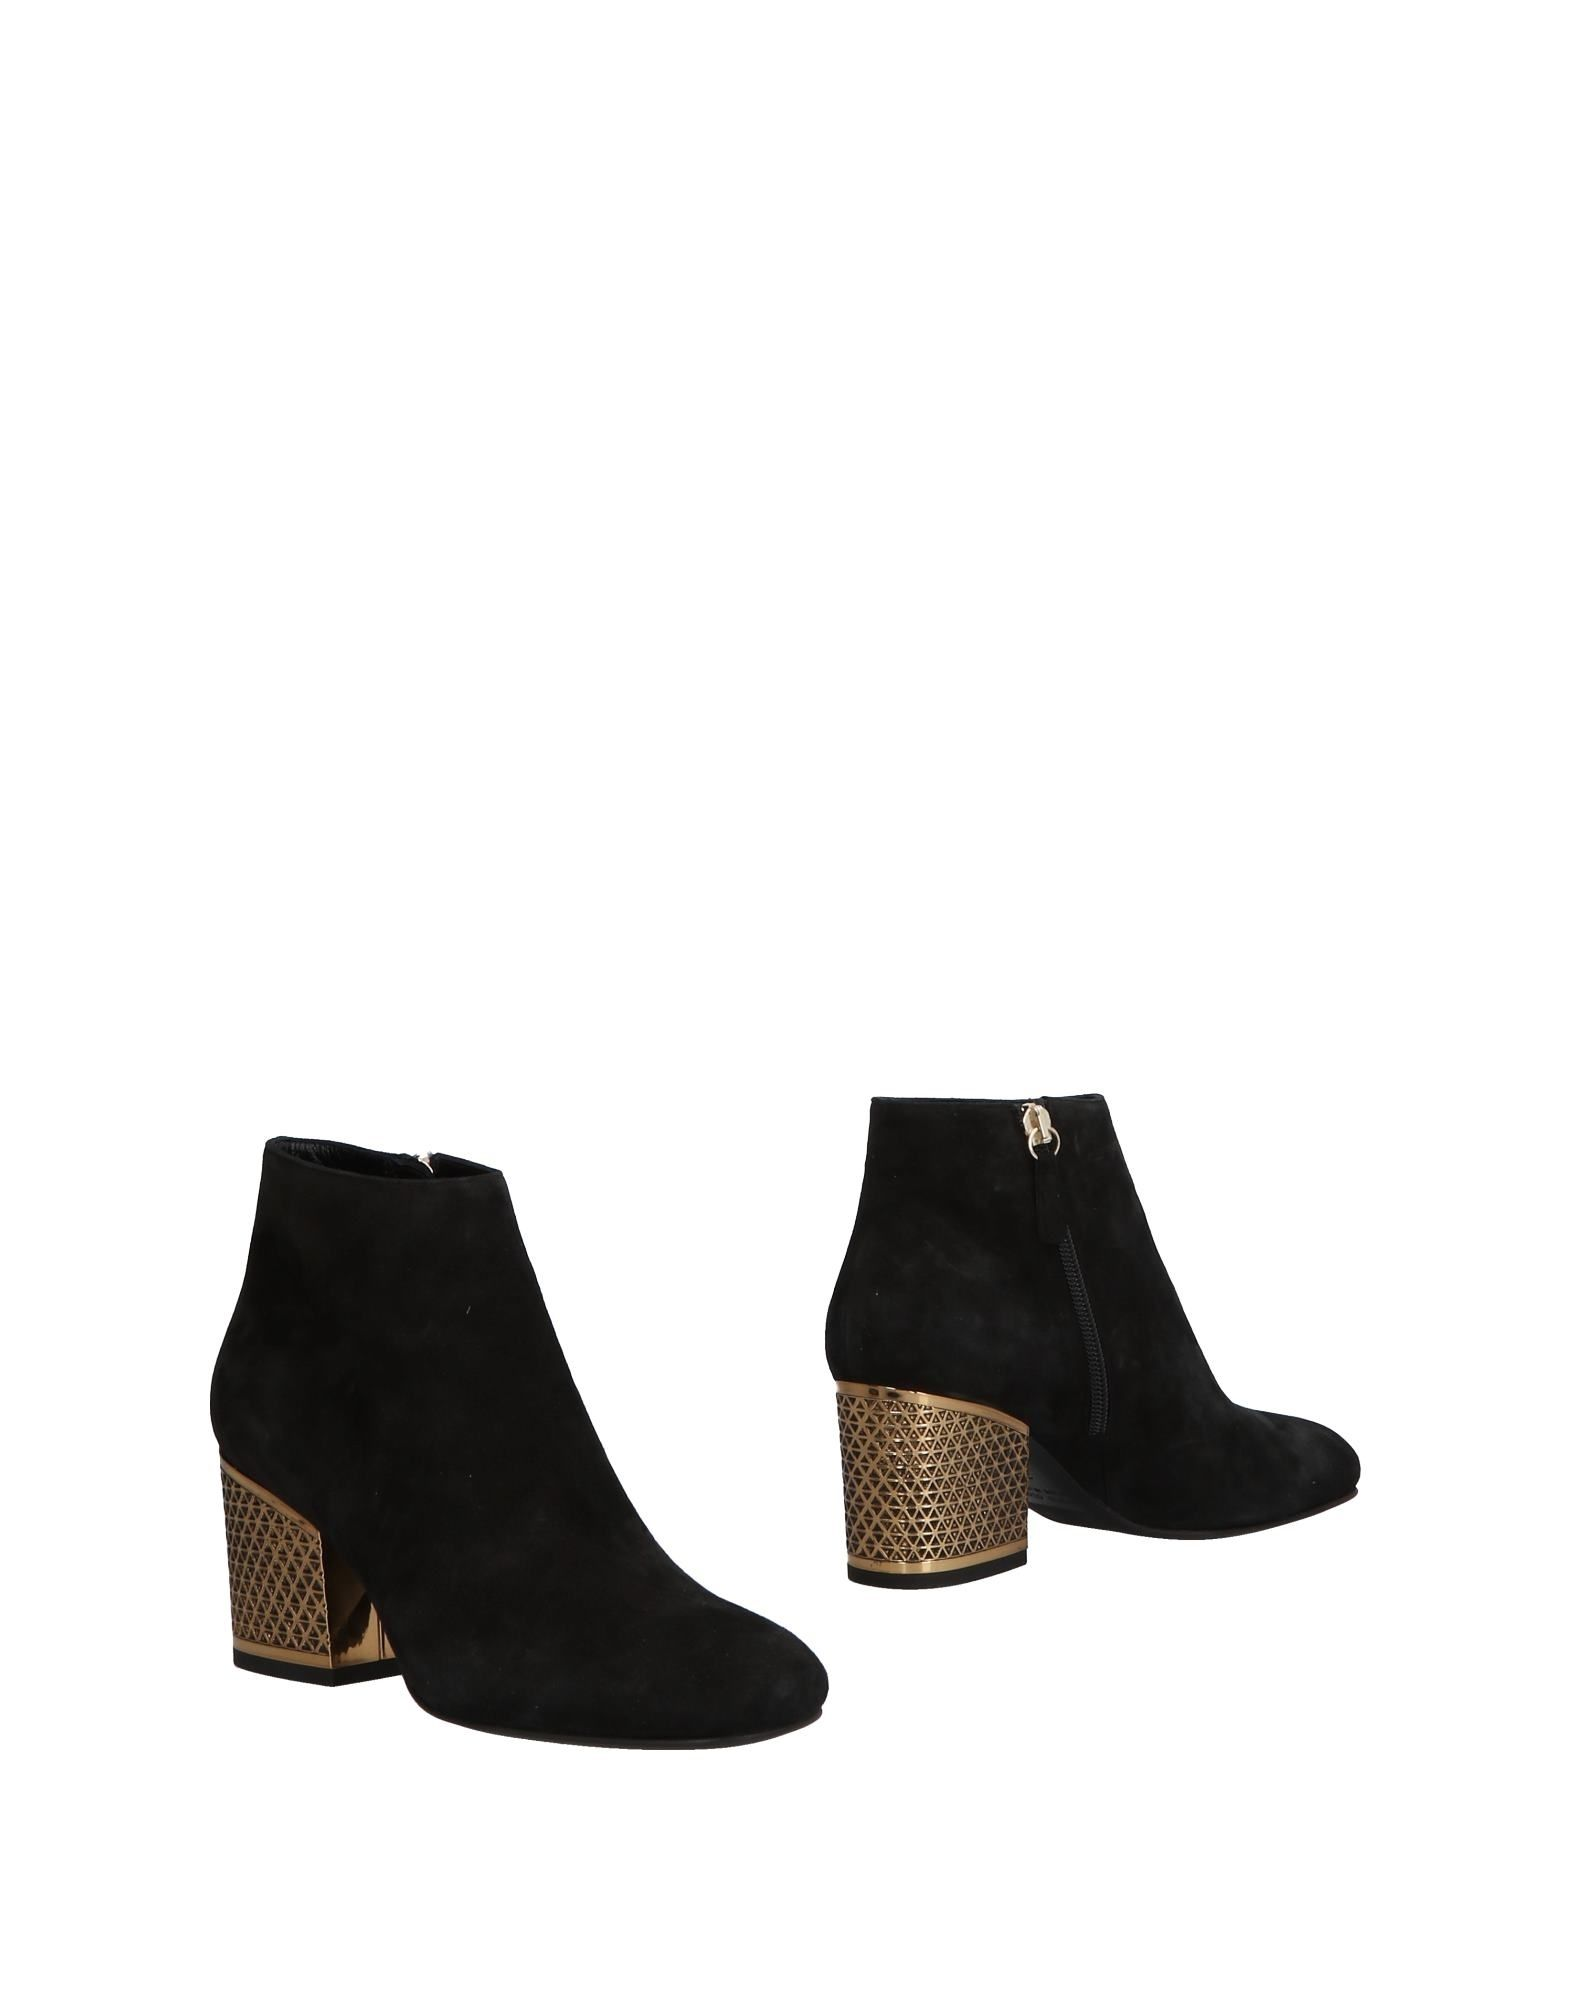 LELLA BALDI Ankle Boot in Black